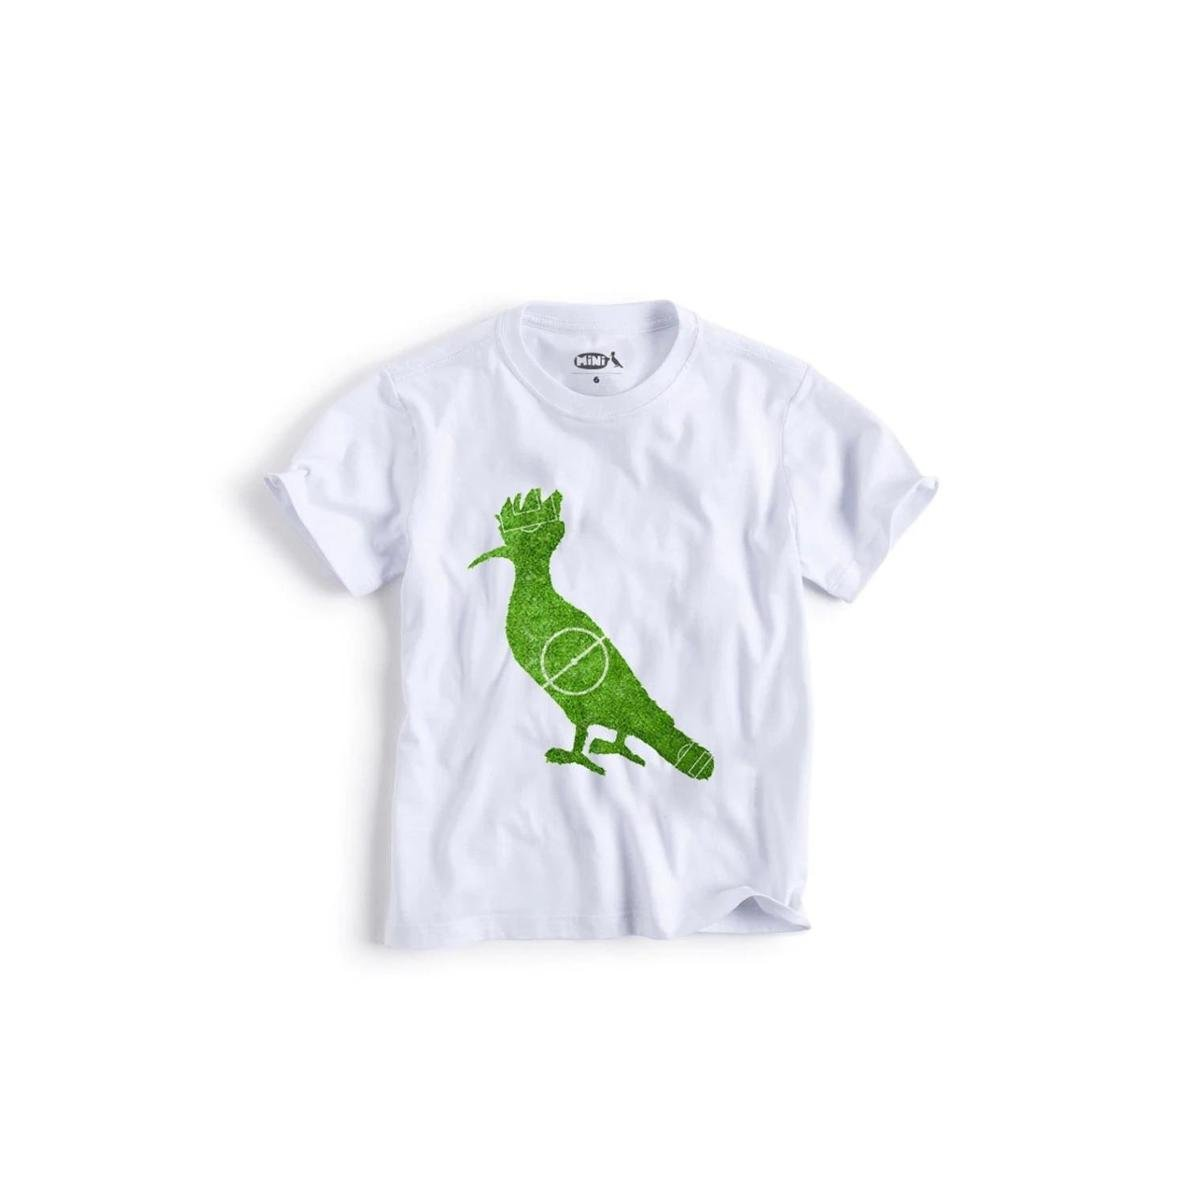 2226ad959 Camiseta Infantil Pica-Pau Futebol Reserva Mini Masculina - Branco - Compre  Agora